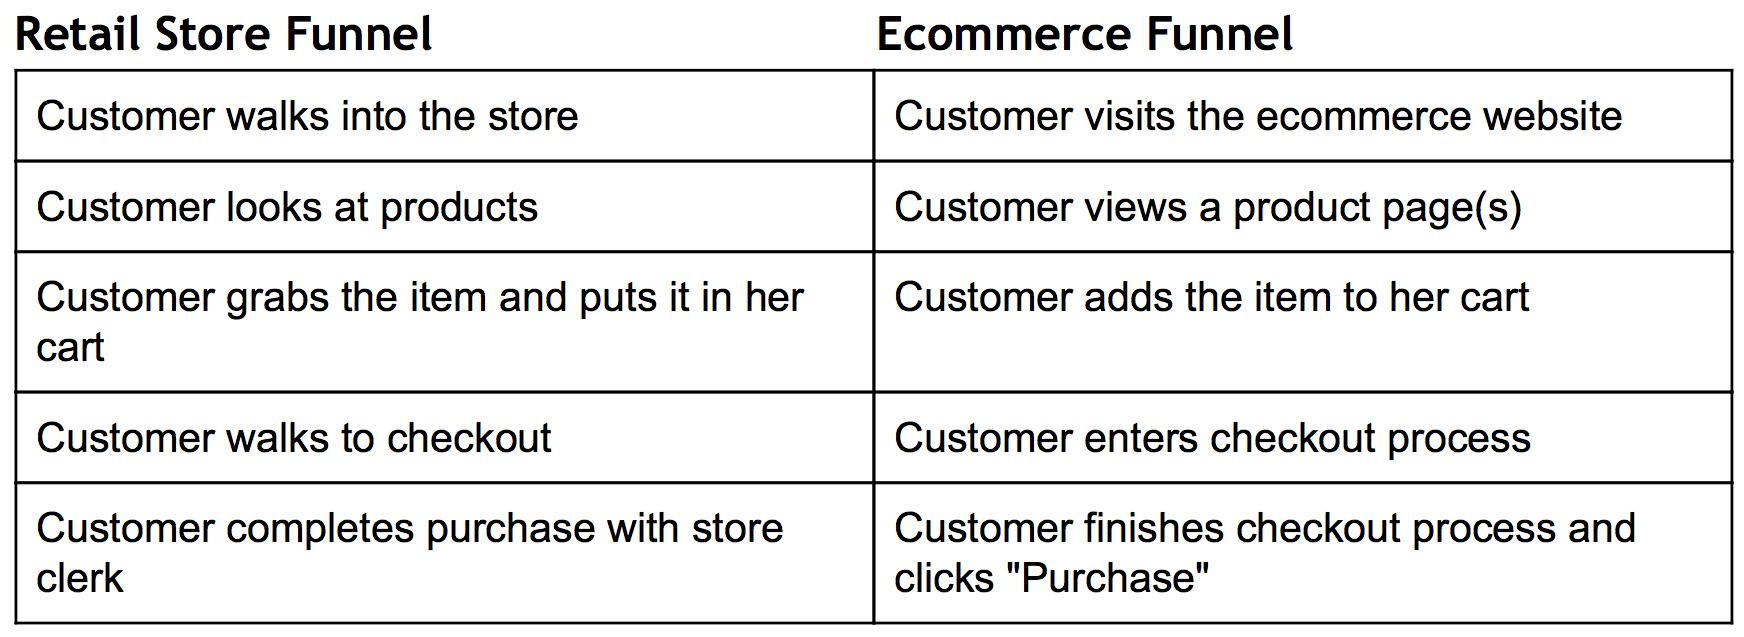 funnel-report-comparison-retail-store-ecommerce